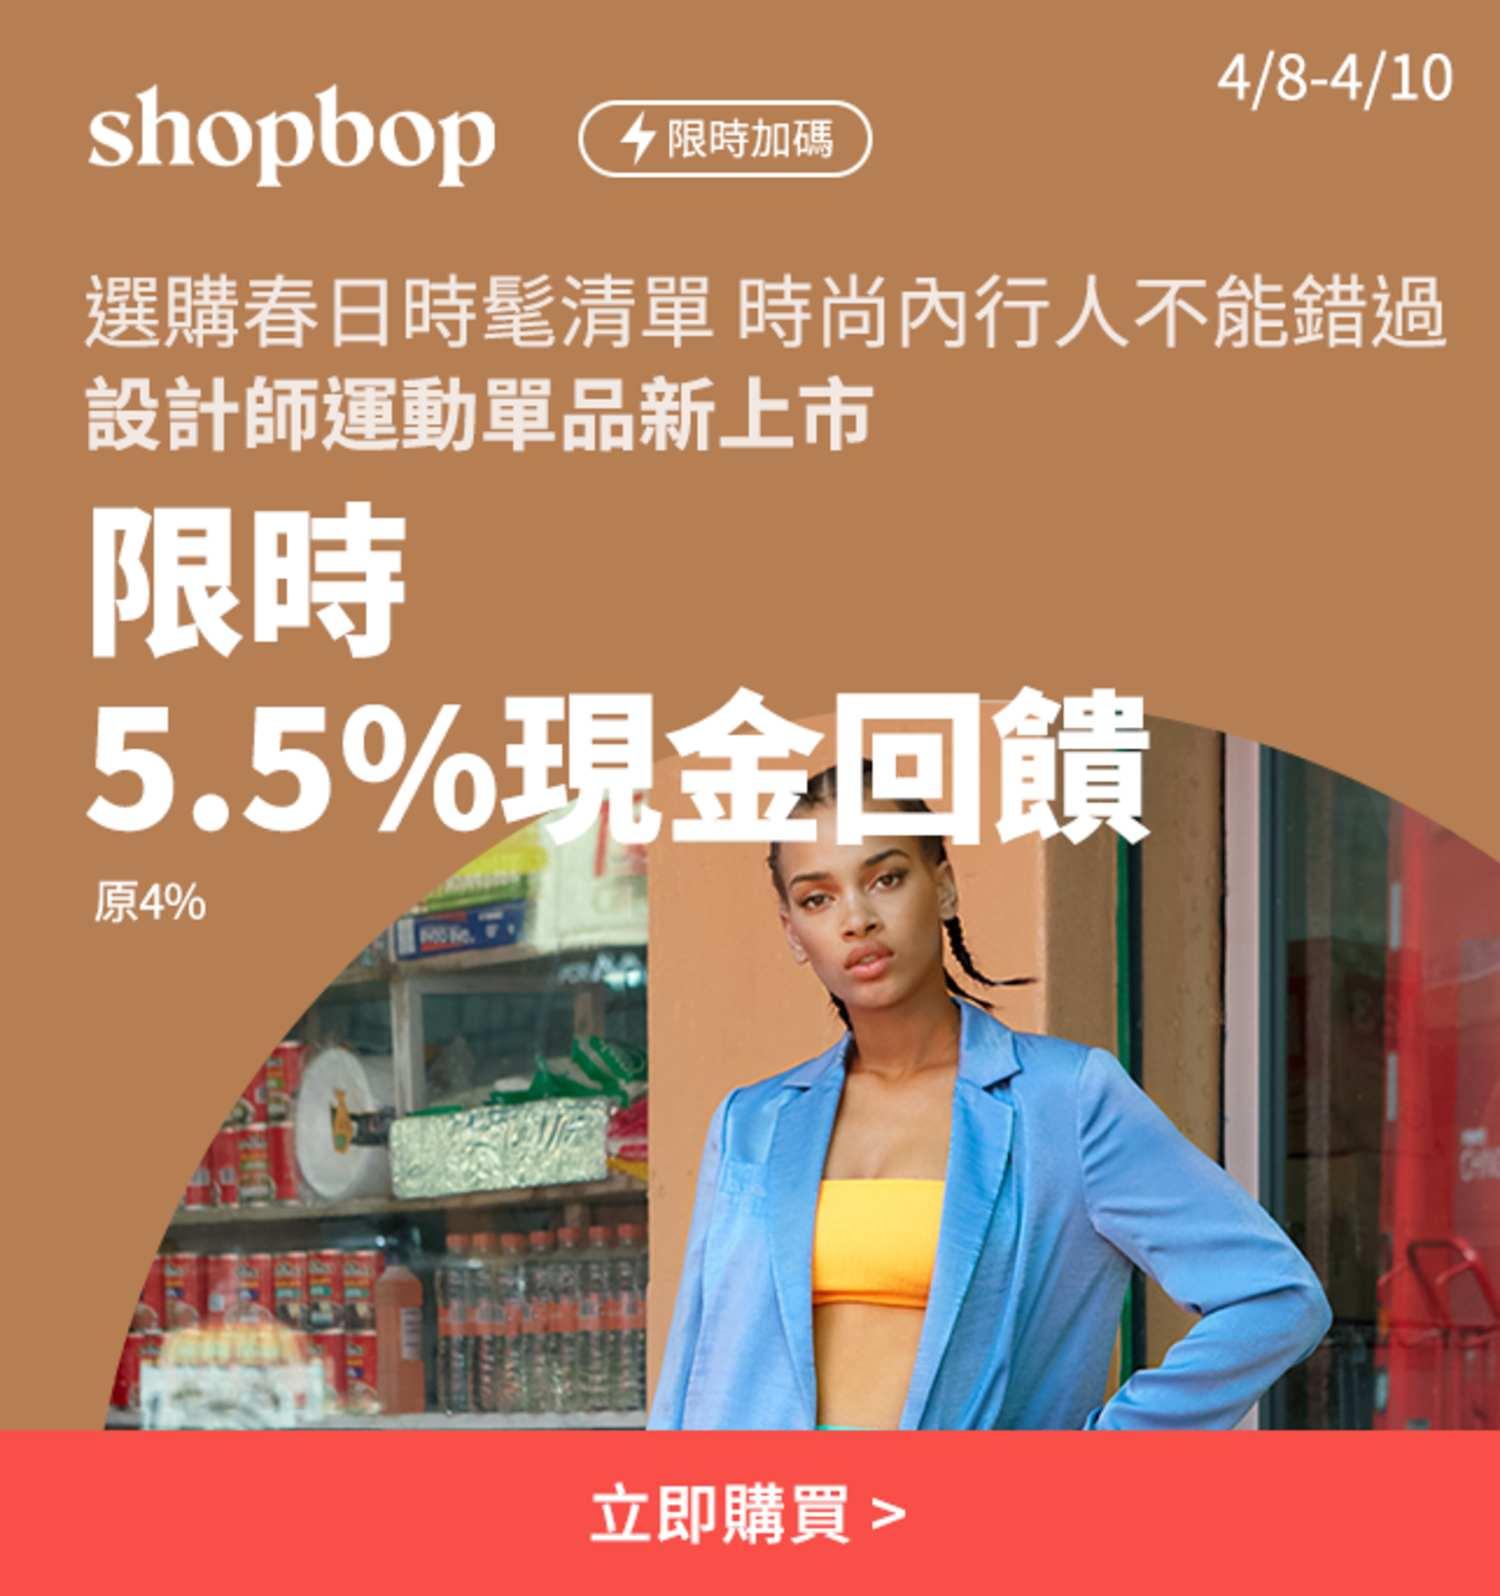 Shopbop 4/6-4/8 限時5.5%